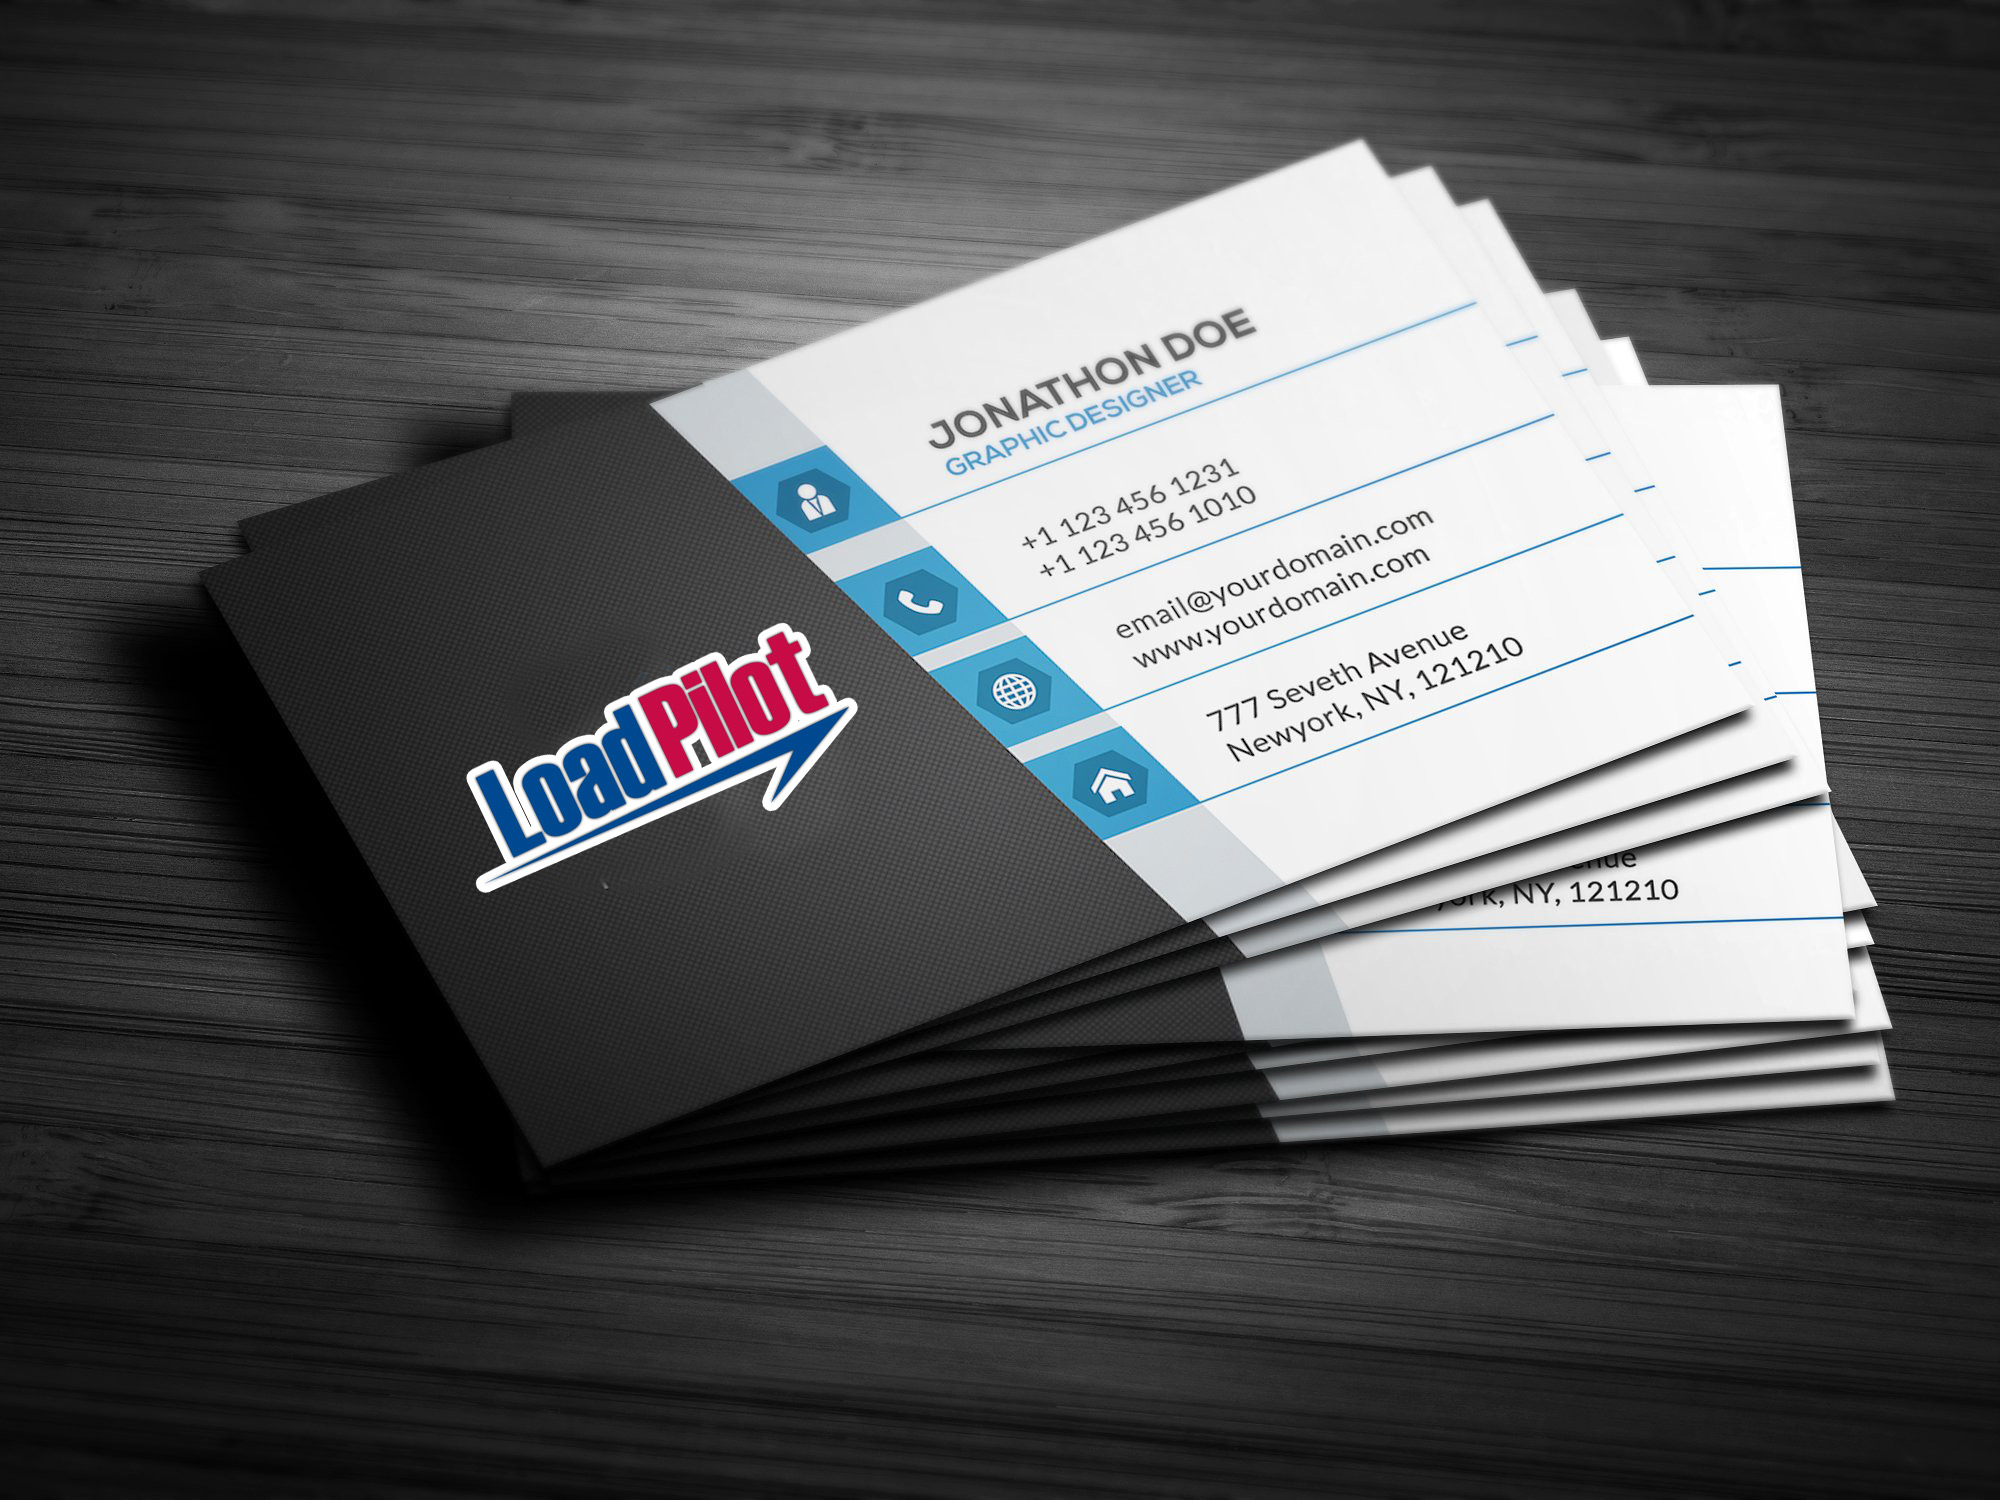 Custom Business Cards Design (1,000 Cards)